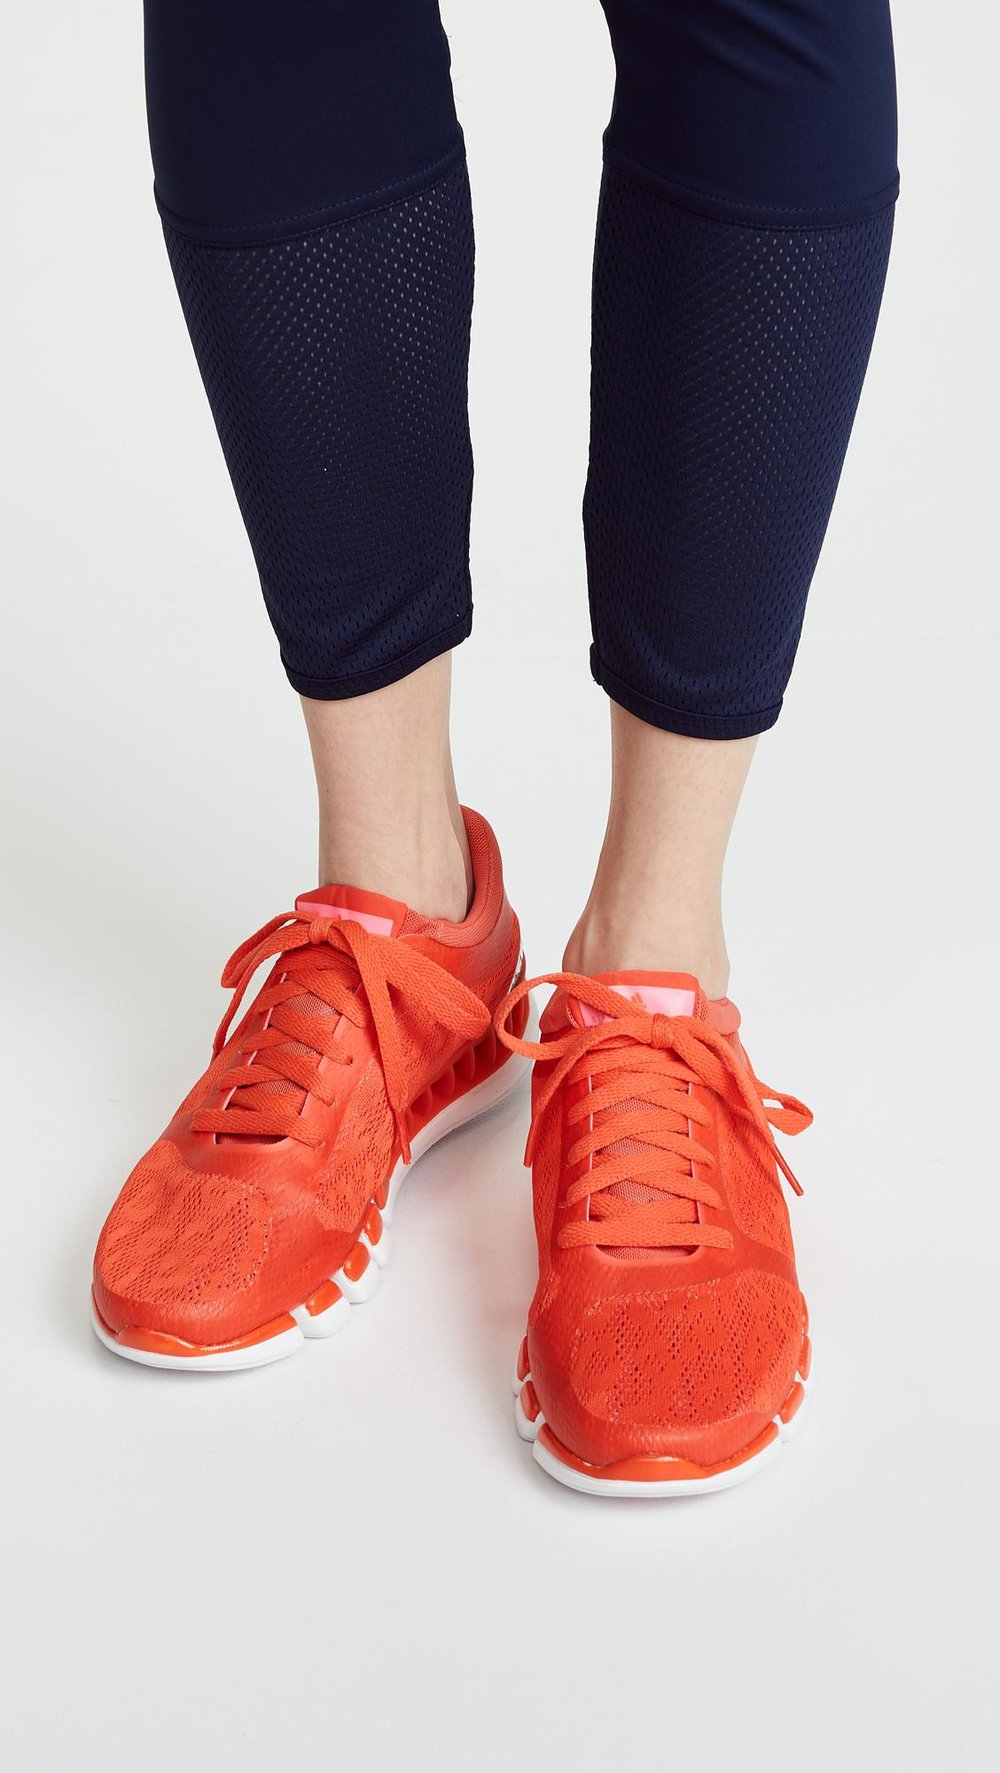 adidas-by-stella-mccartney-Solar-RedSolar-PinkSilver-Kea-Clima-Sneakers.jpeg